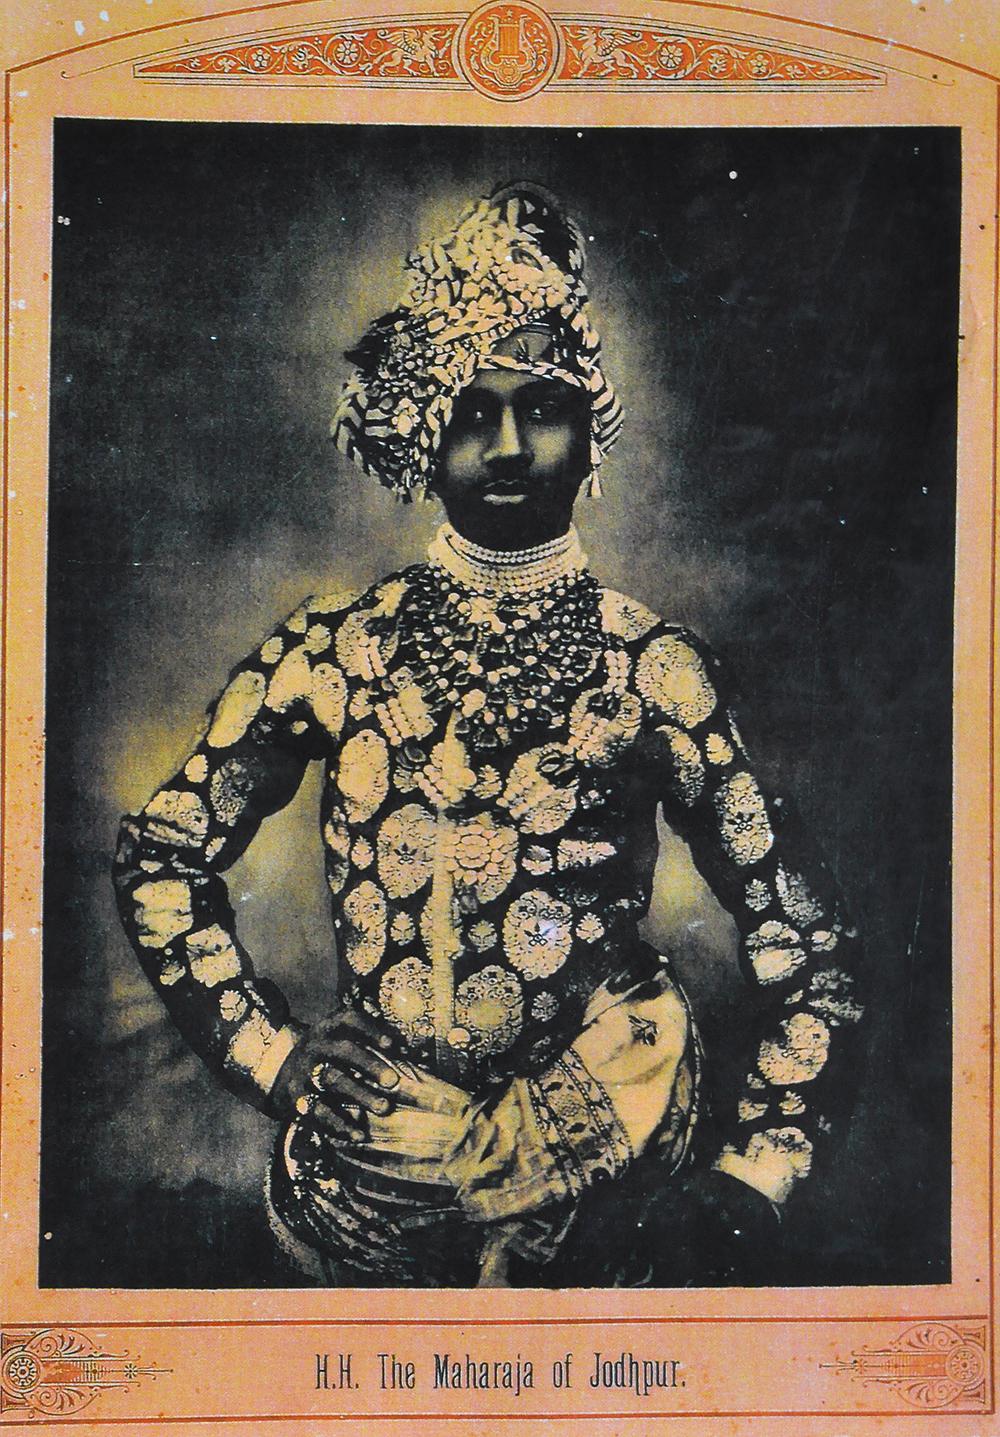 Maharaja of Jodhpur - Photogravure 1915